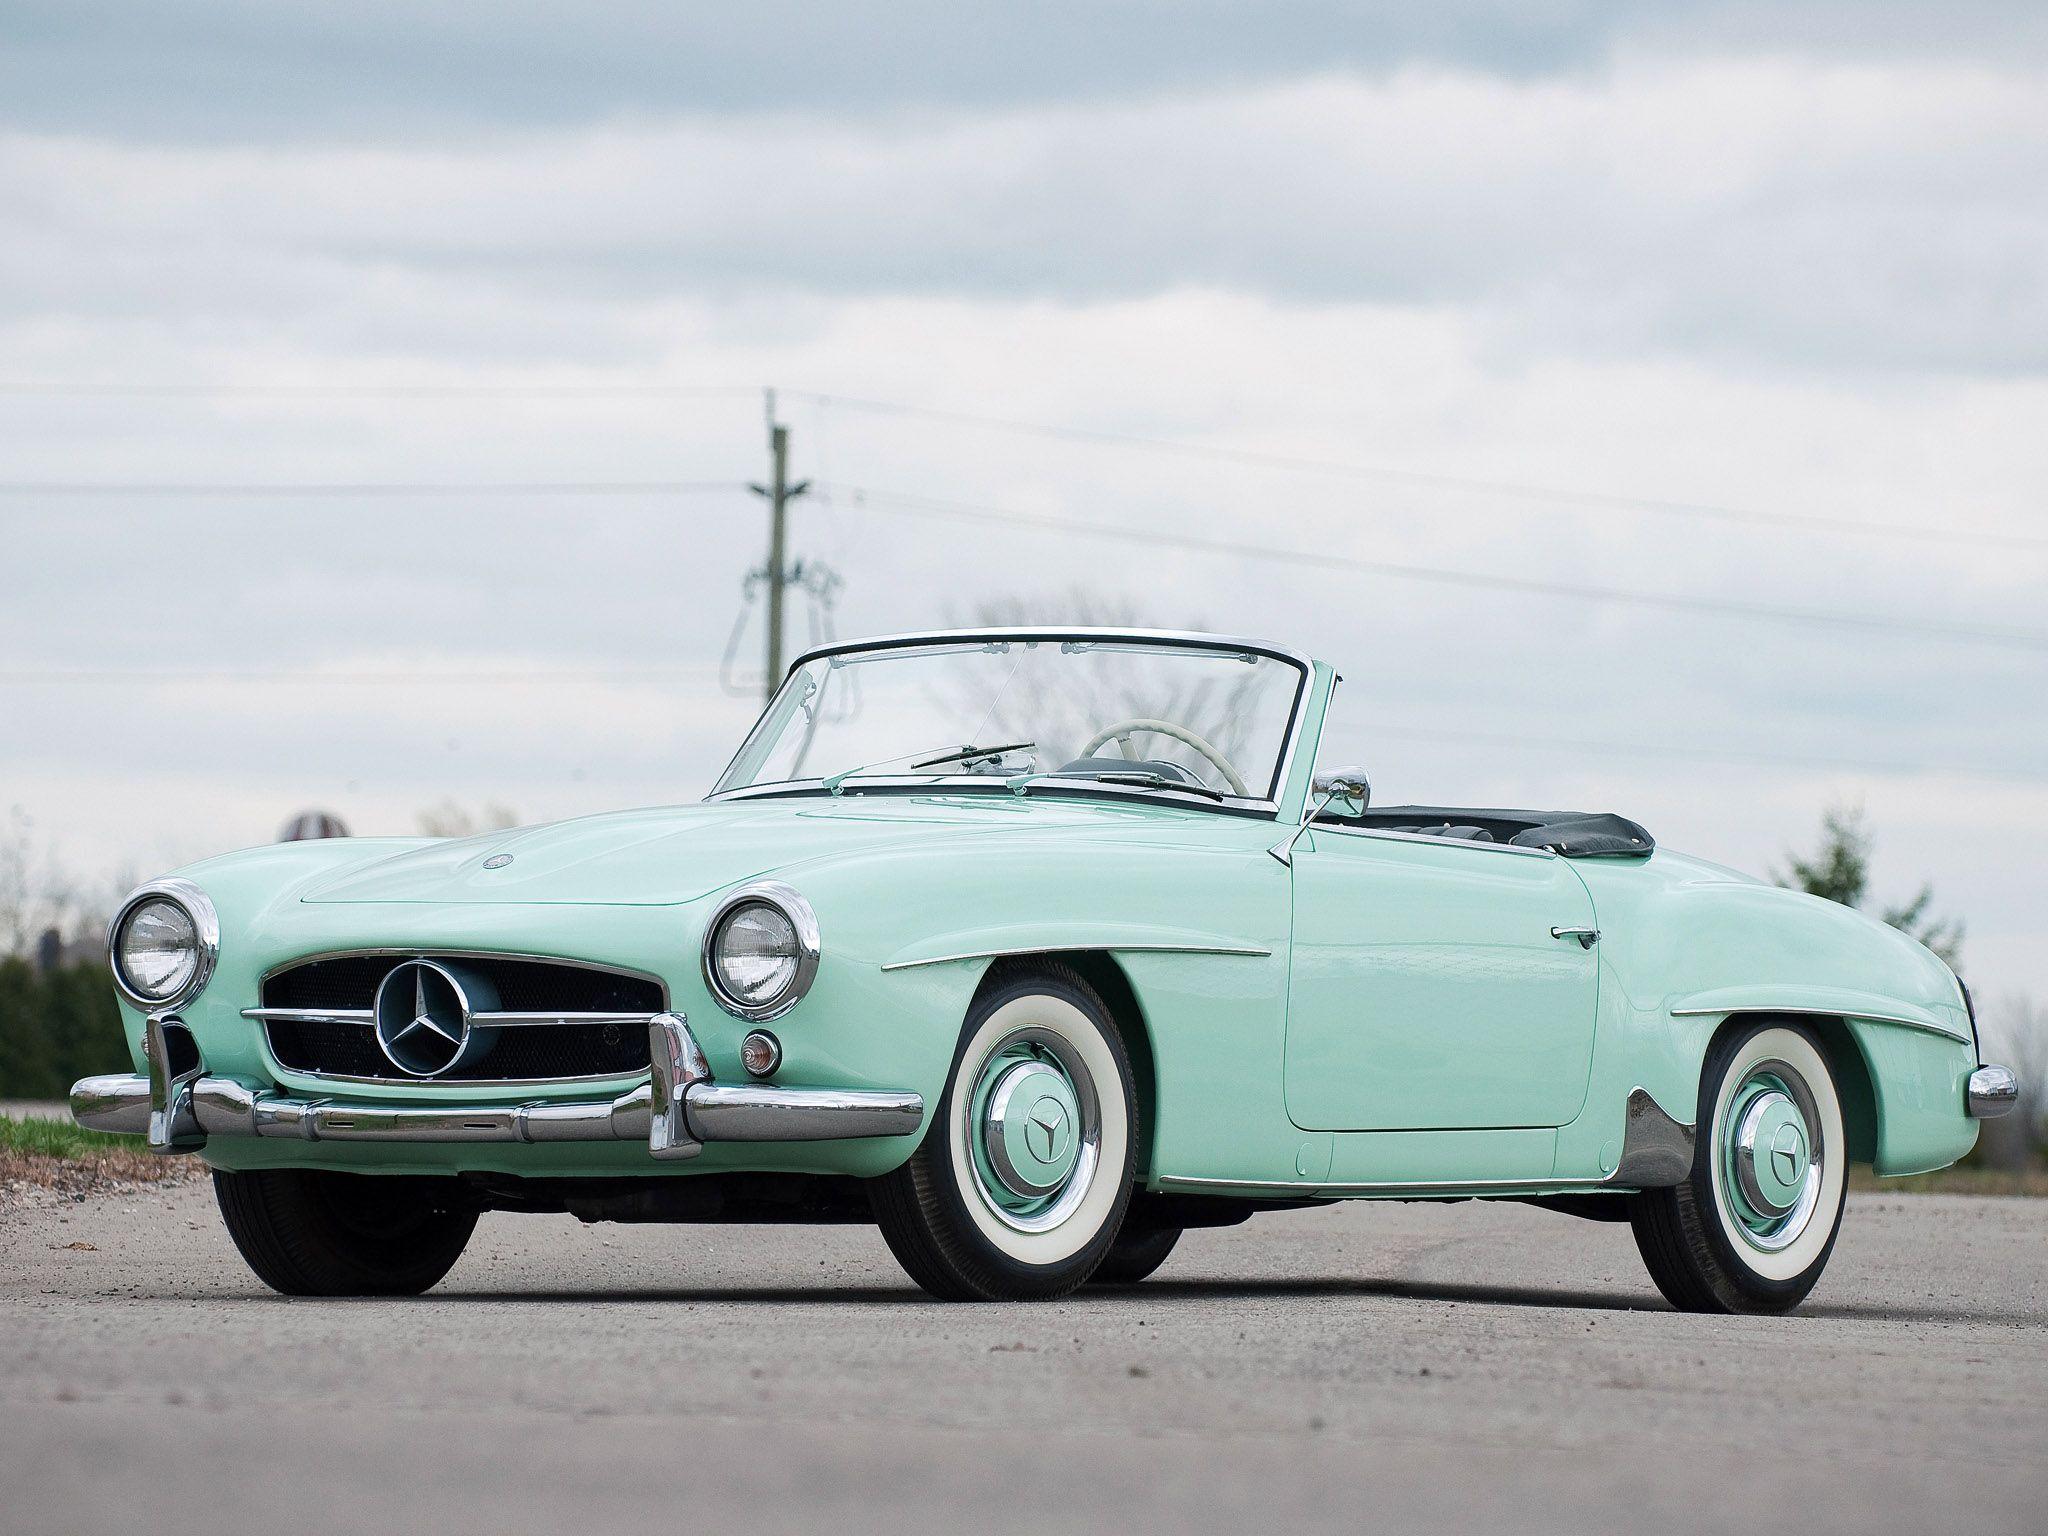 1955 Mercedes Benz 190sl Mercedes Benz 190 Mercedes Benz Benz